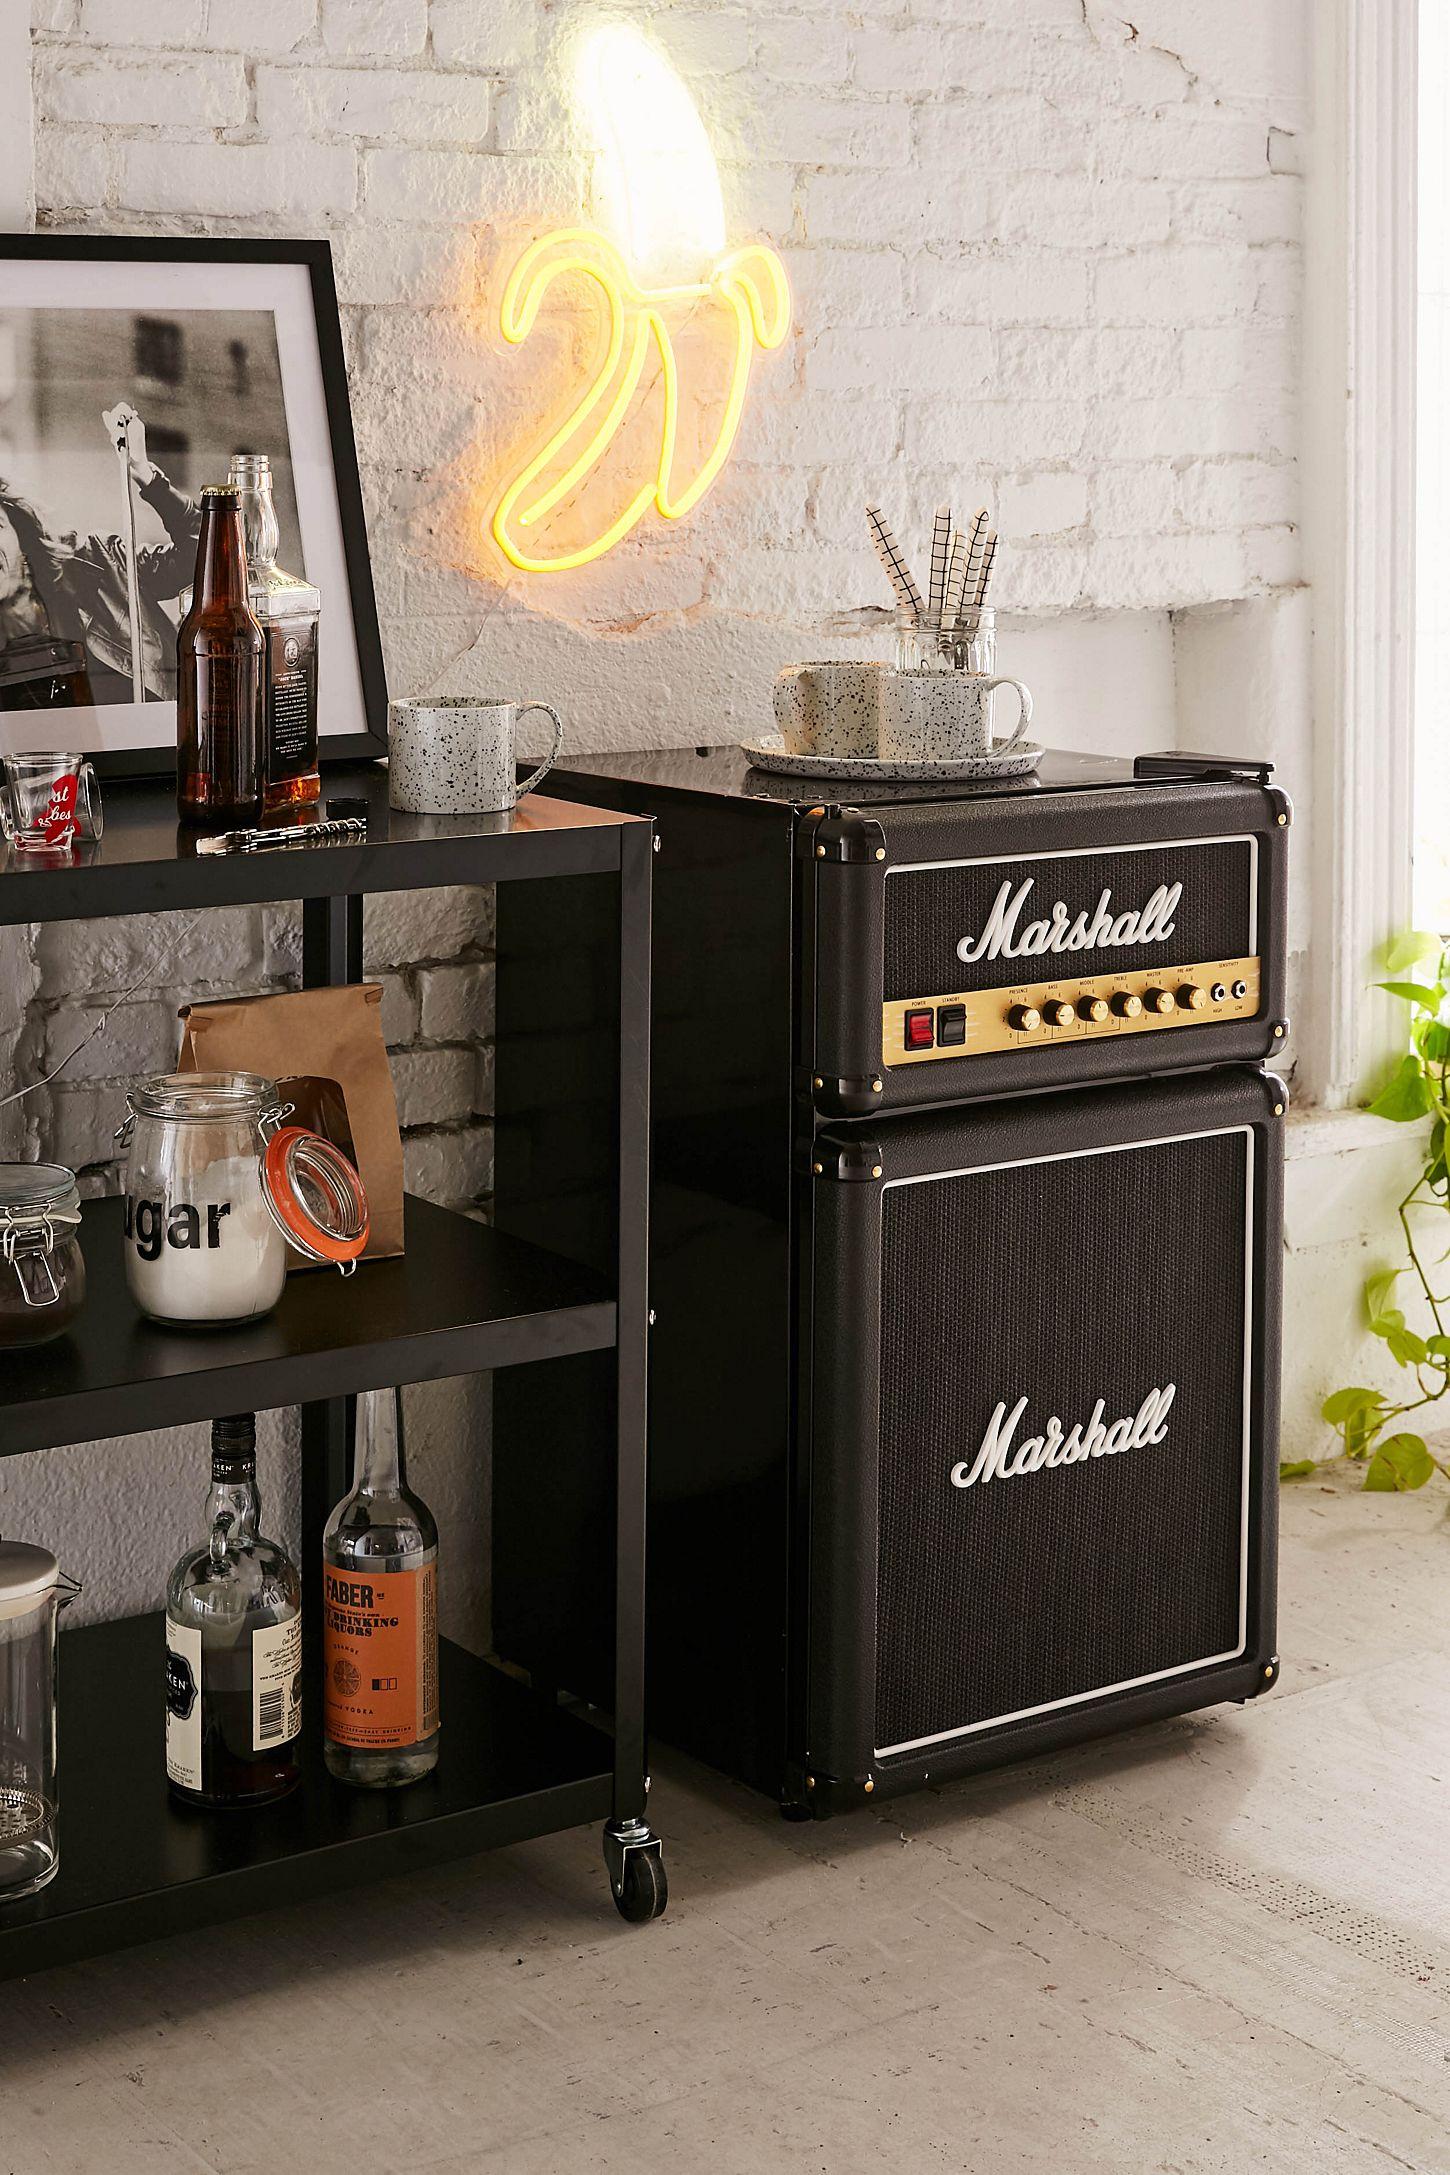 hot sale online 6cd19 2136e Marshall Mini Refrigerator